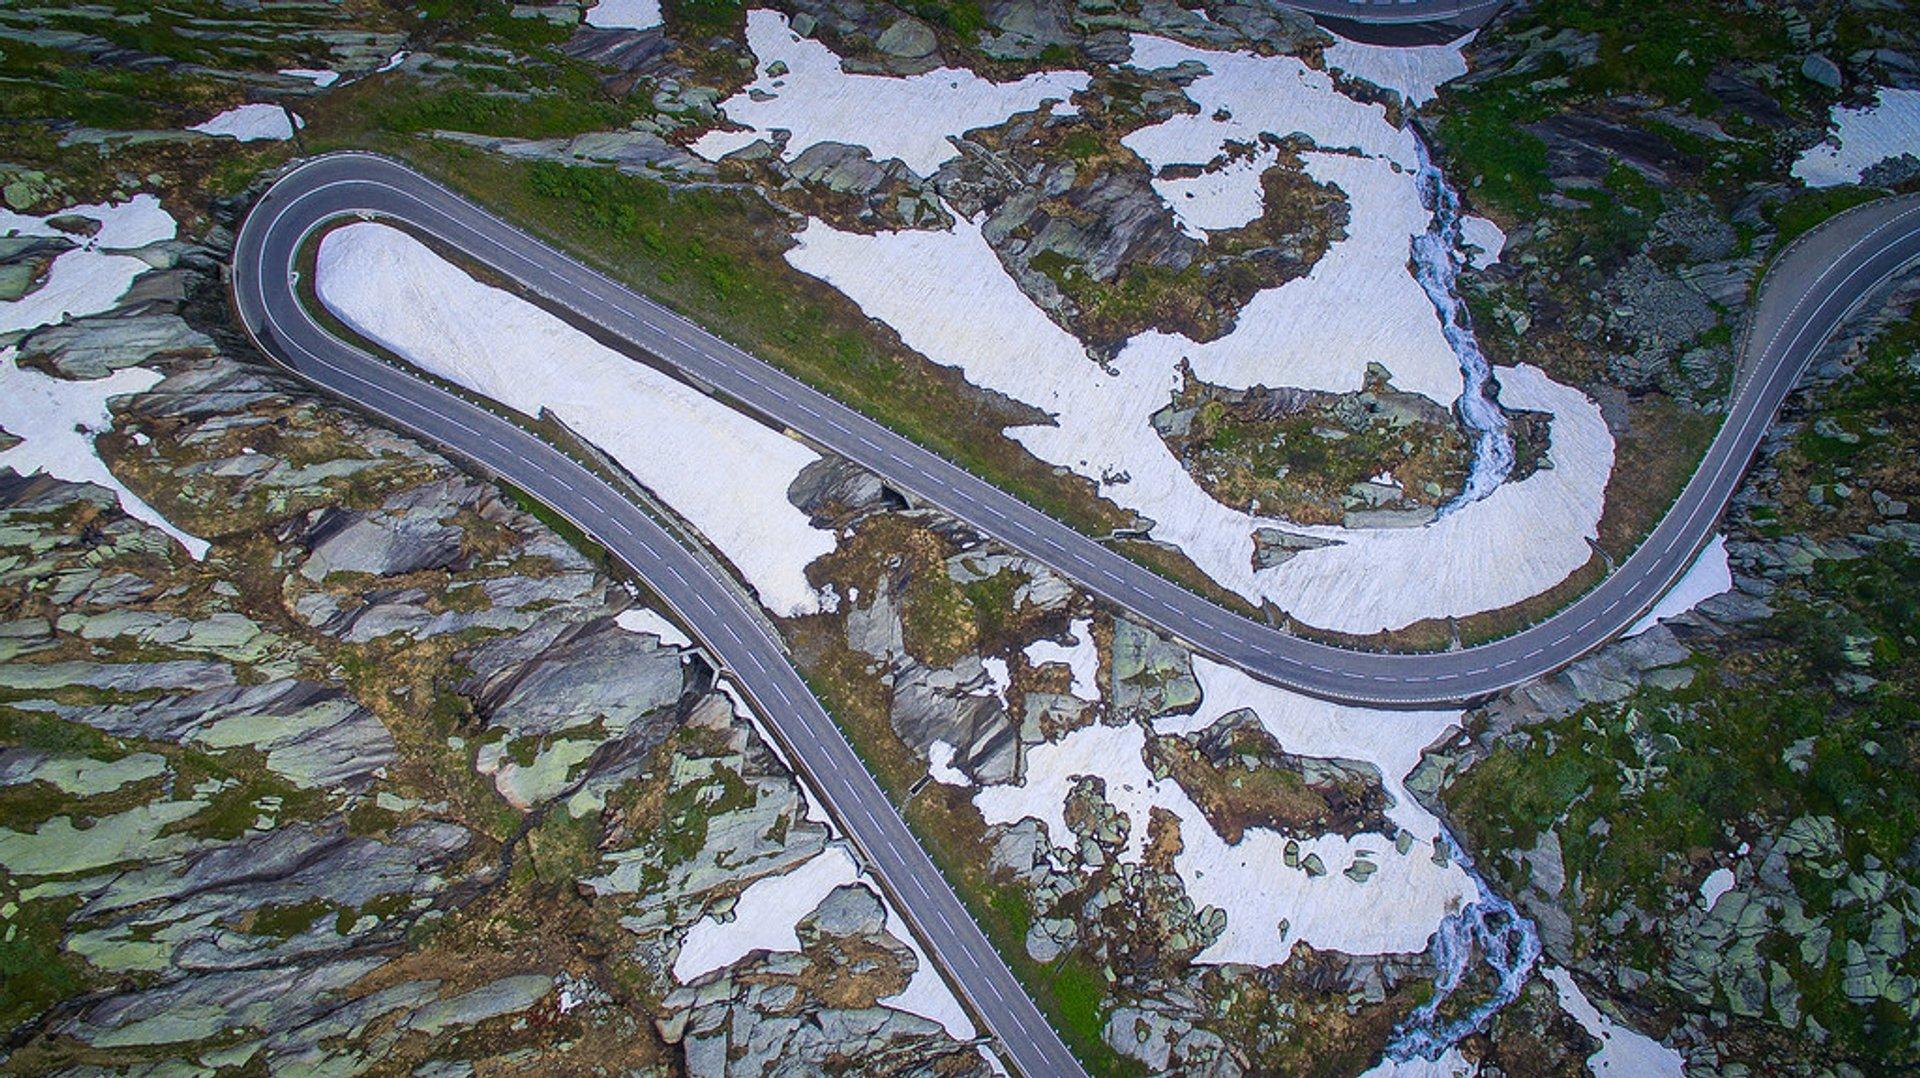 Grimsel Pass in Switzerland 2019 - Best Time